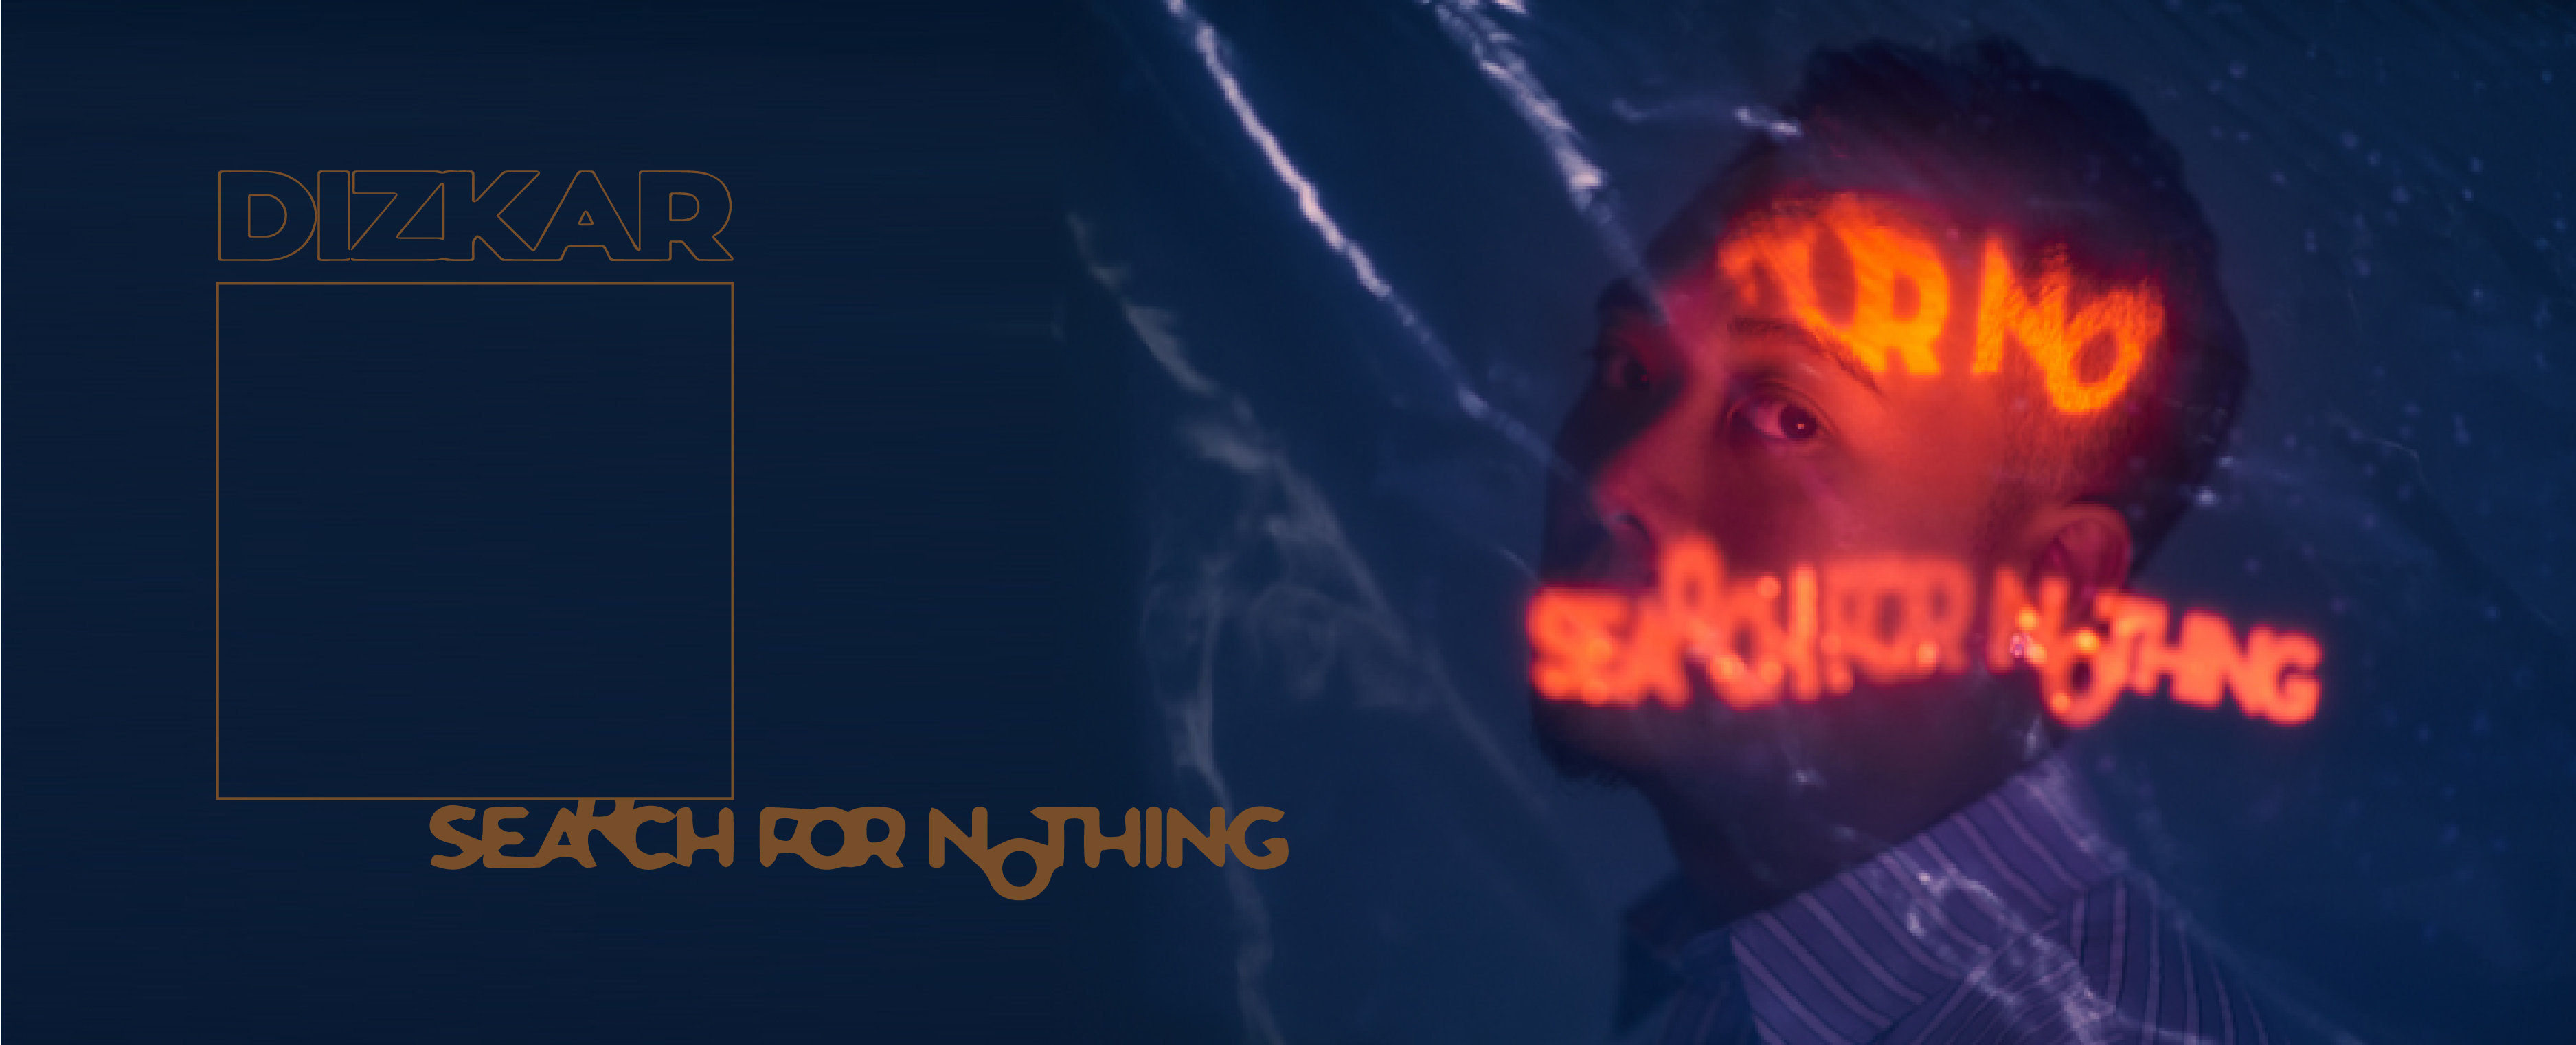 Dizkar / Search for Nothing